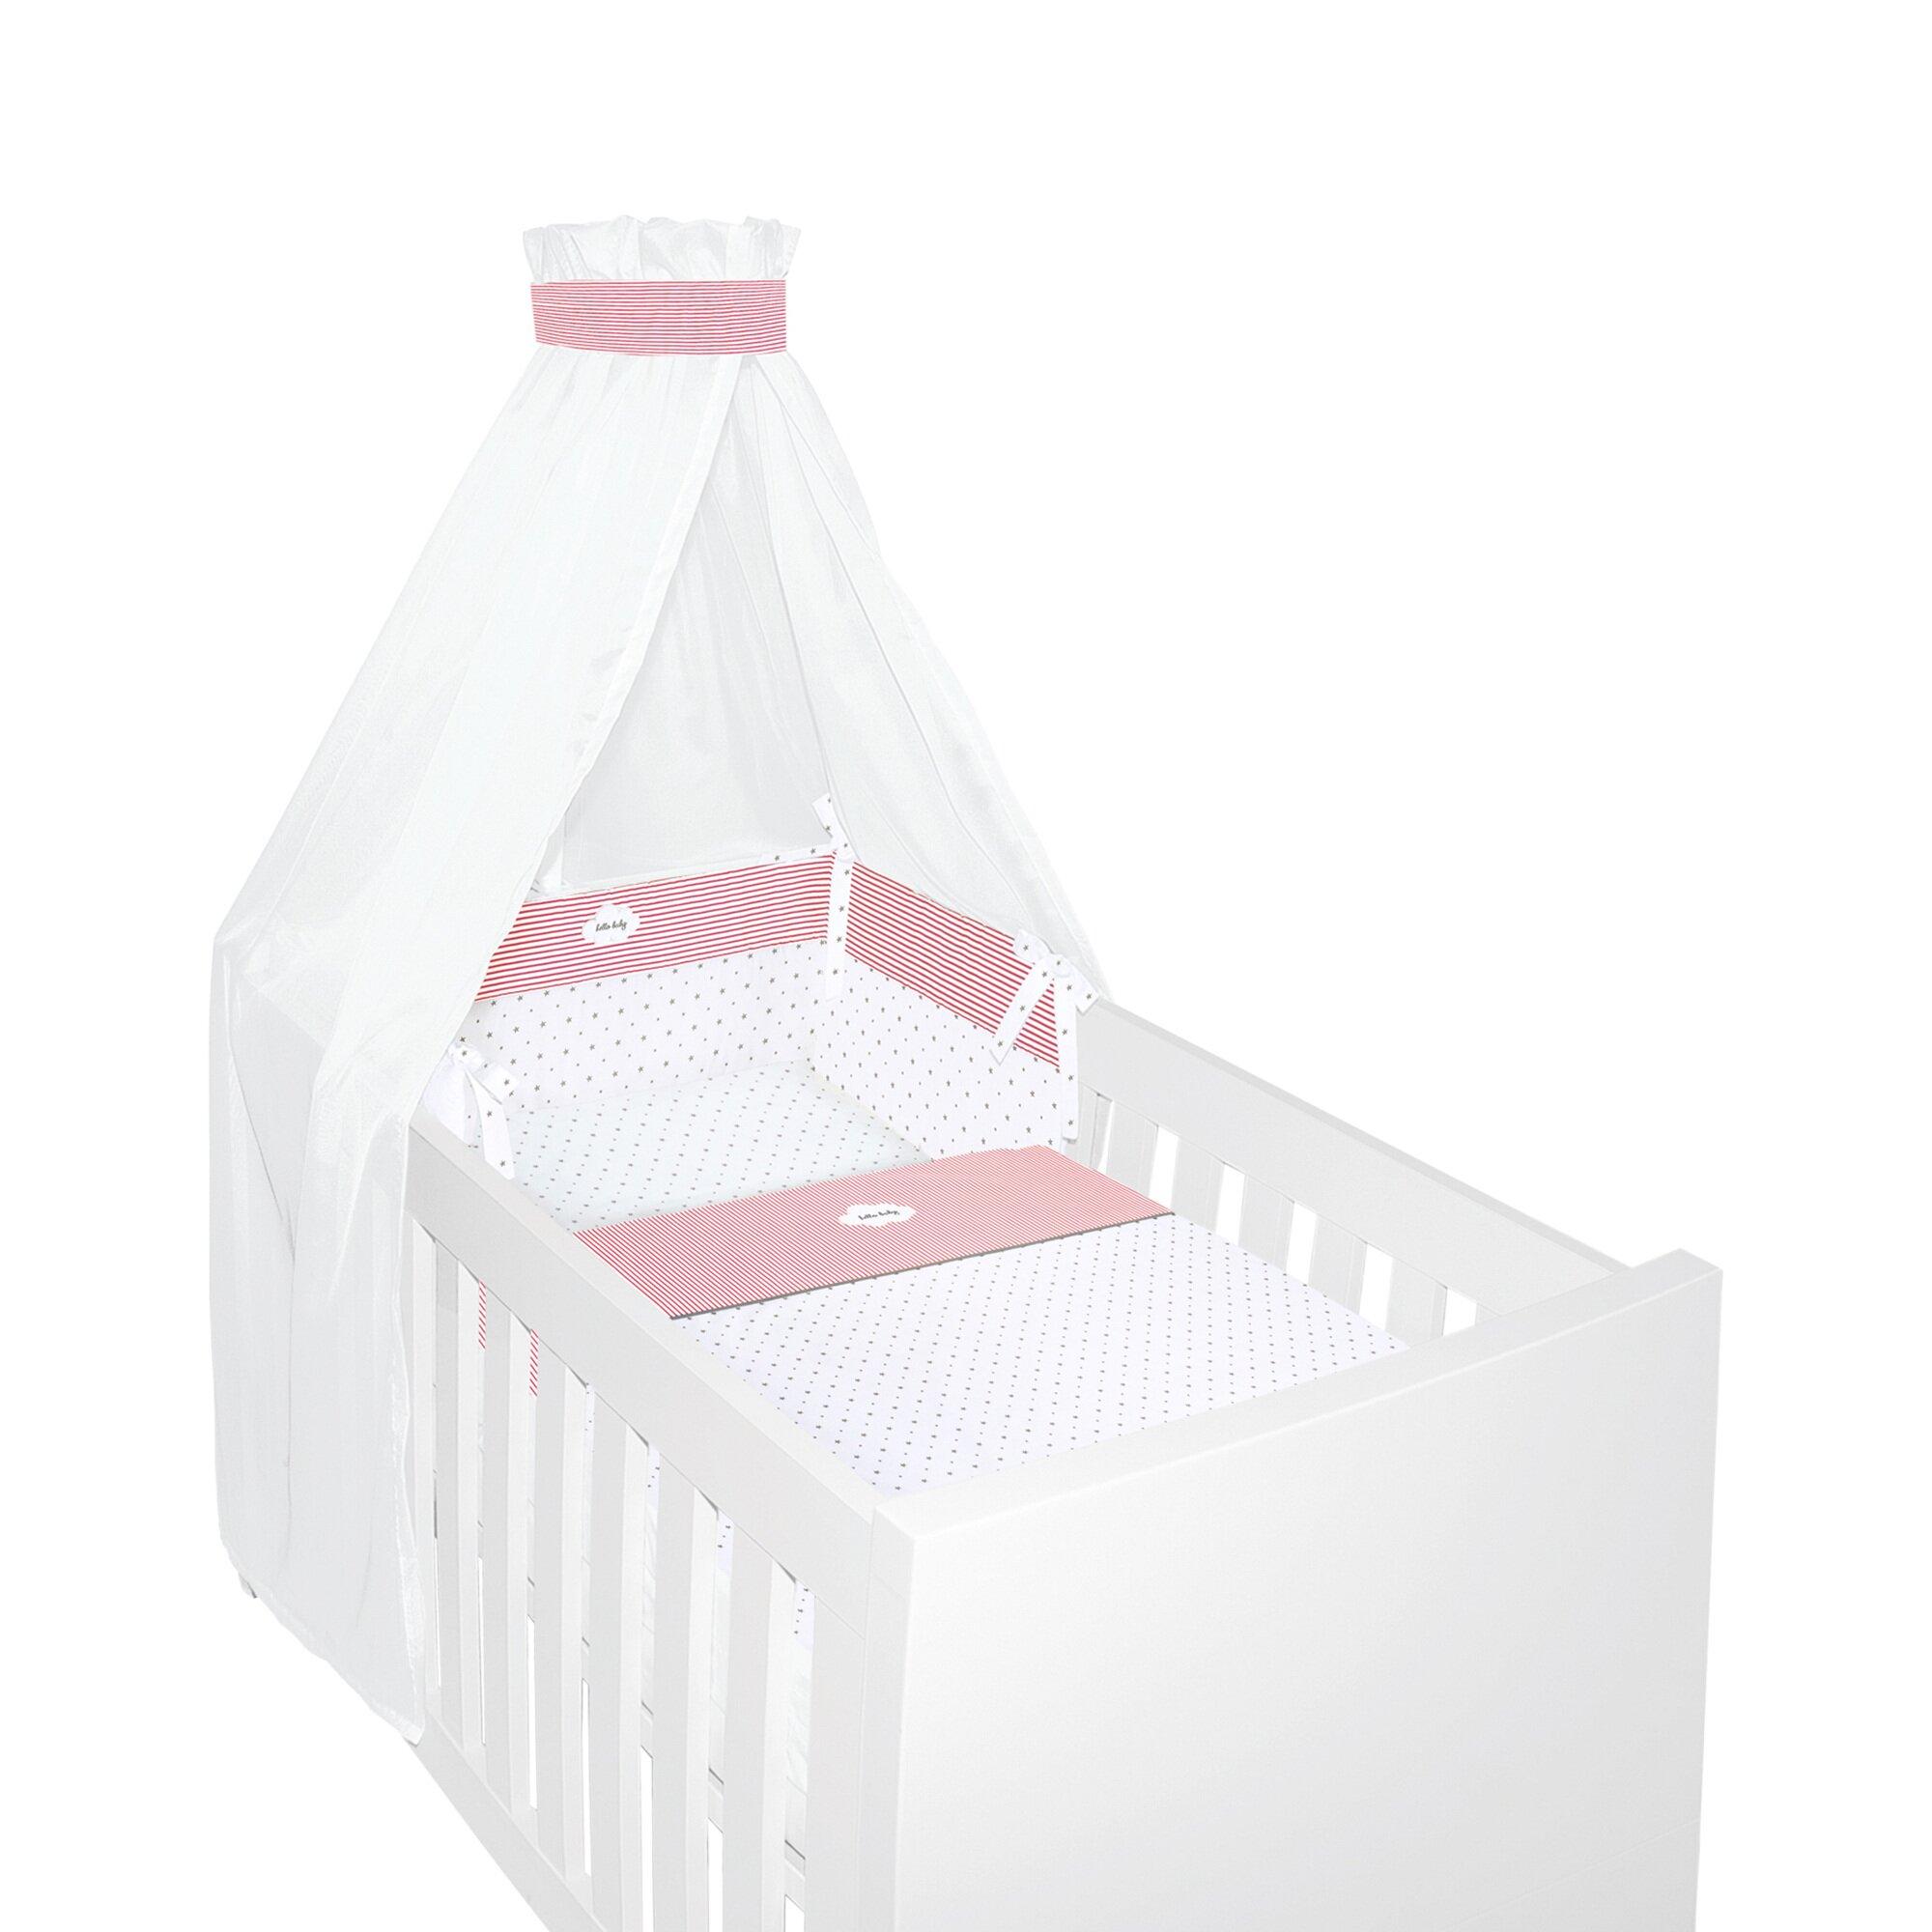 Bornino Home 4-tlg. Bettwäscheset hello baby 40x60 / 100x135 cm pink